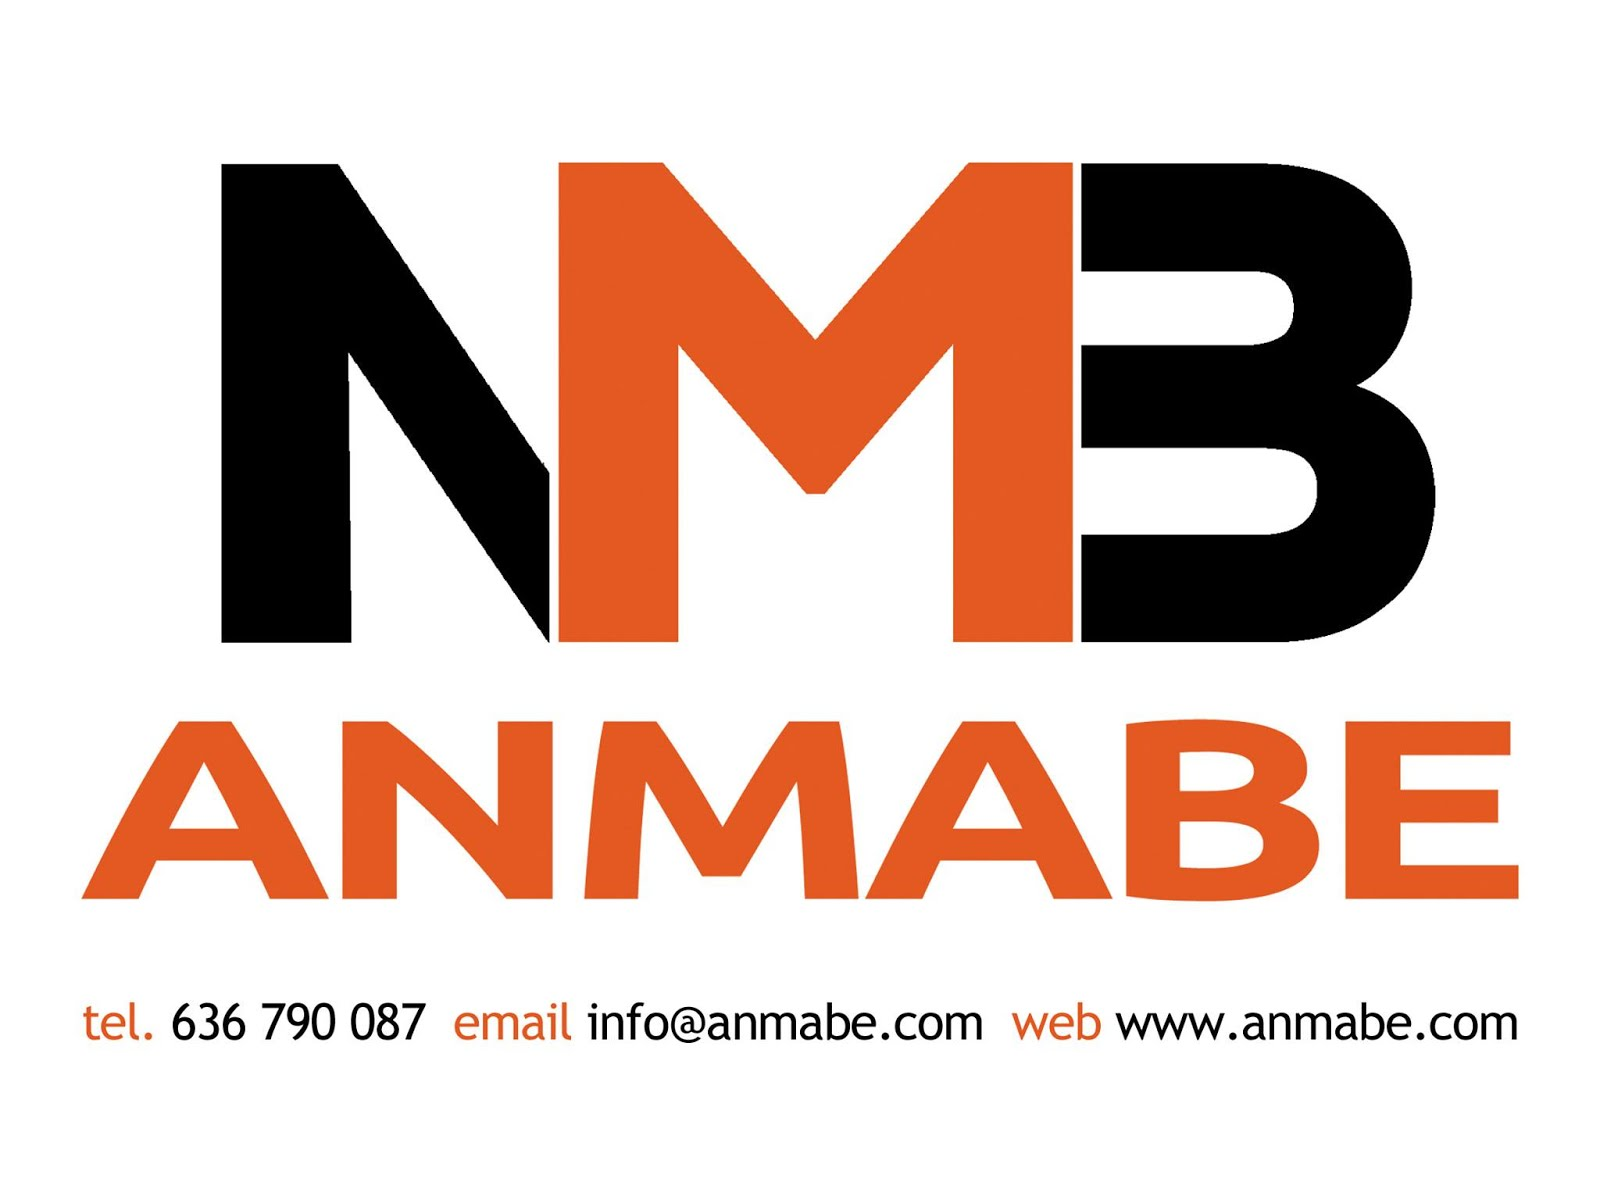 ANMABE